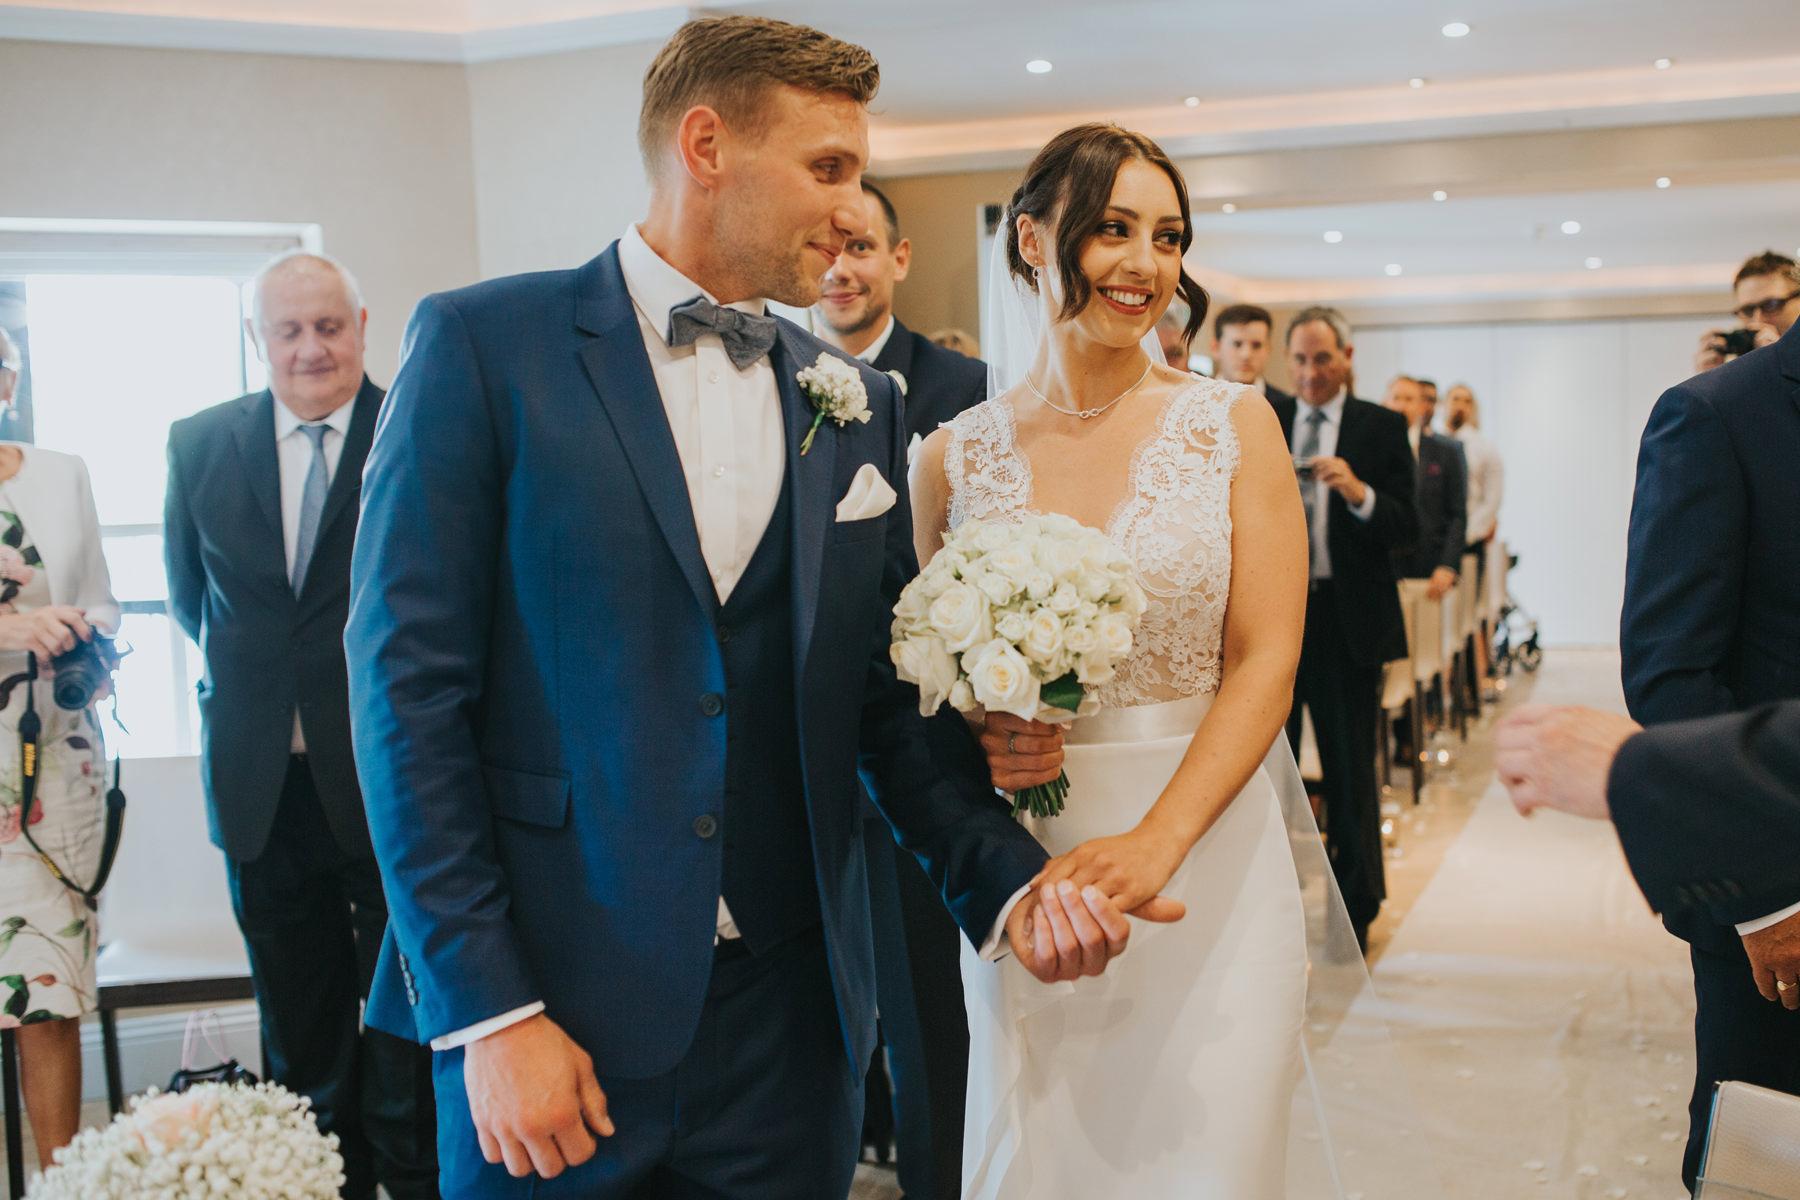 The Bingham Wedding Photographer London--groom waiting bride coming down aisle-CRL-133.jpg